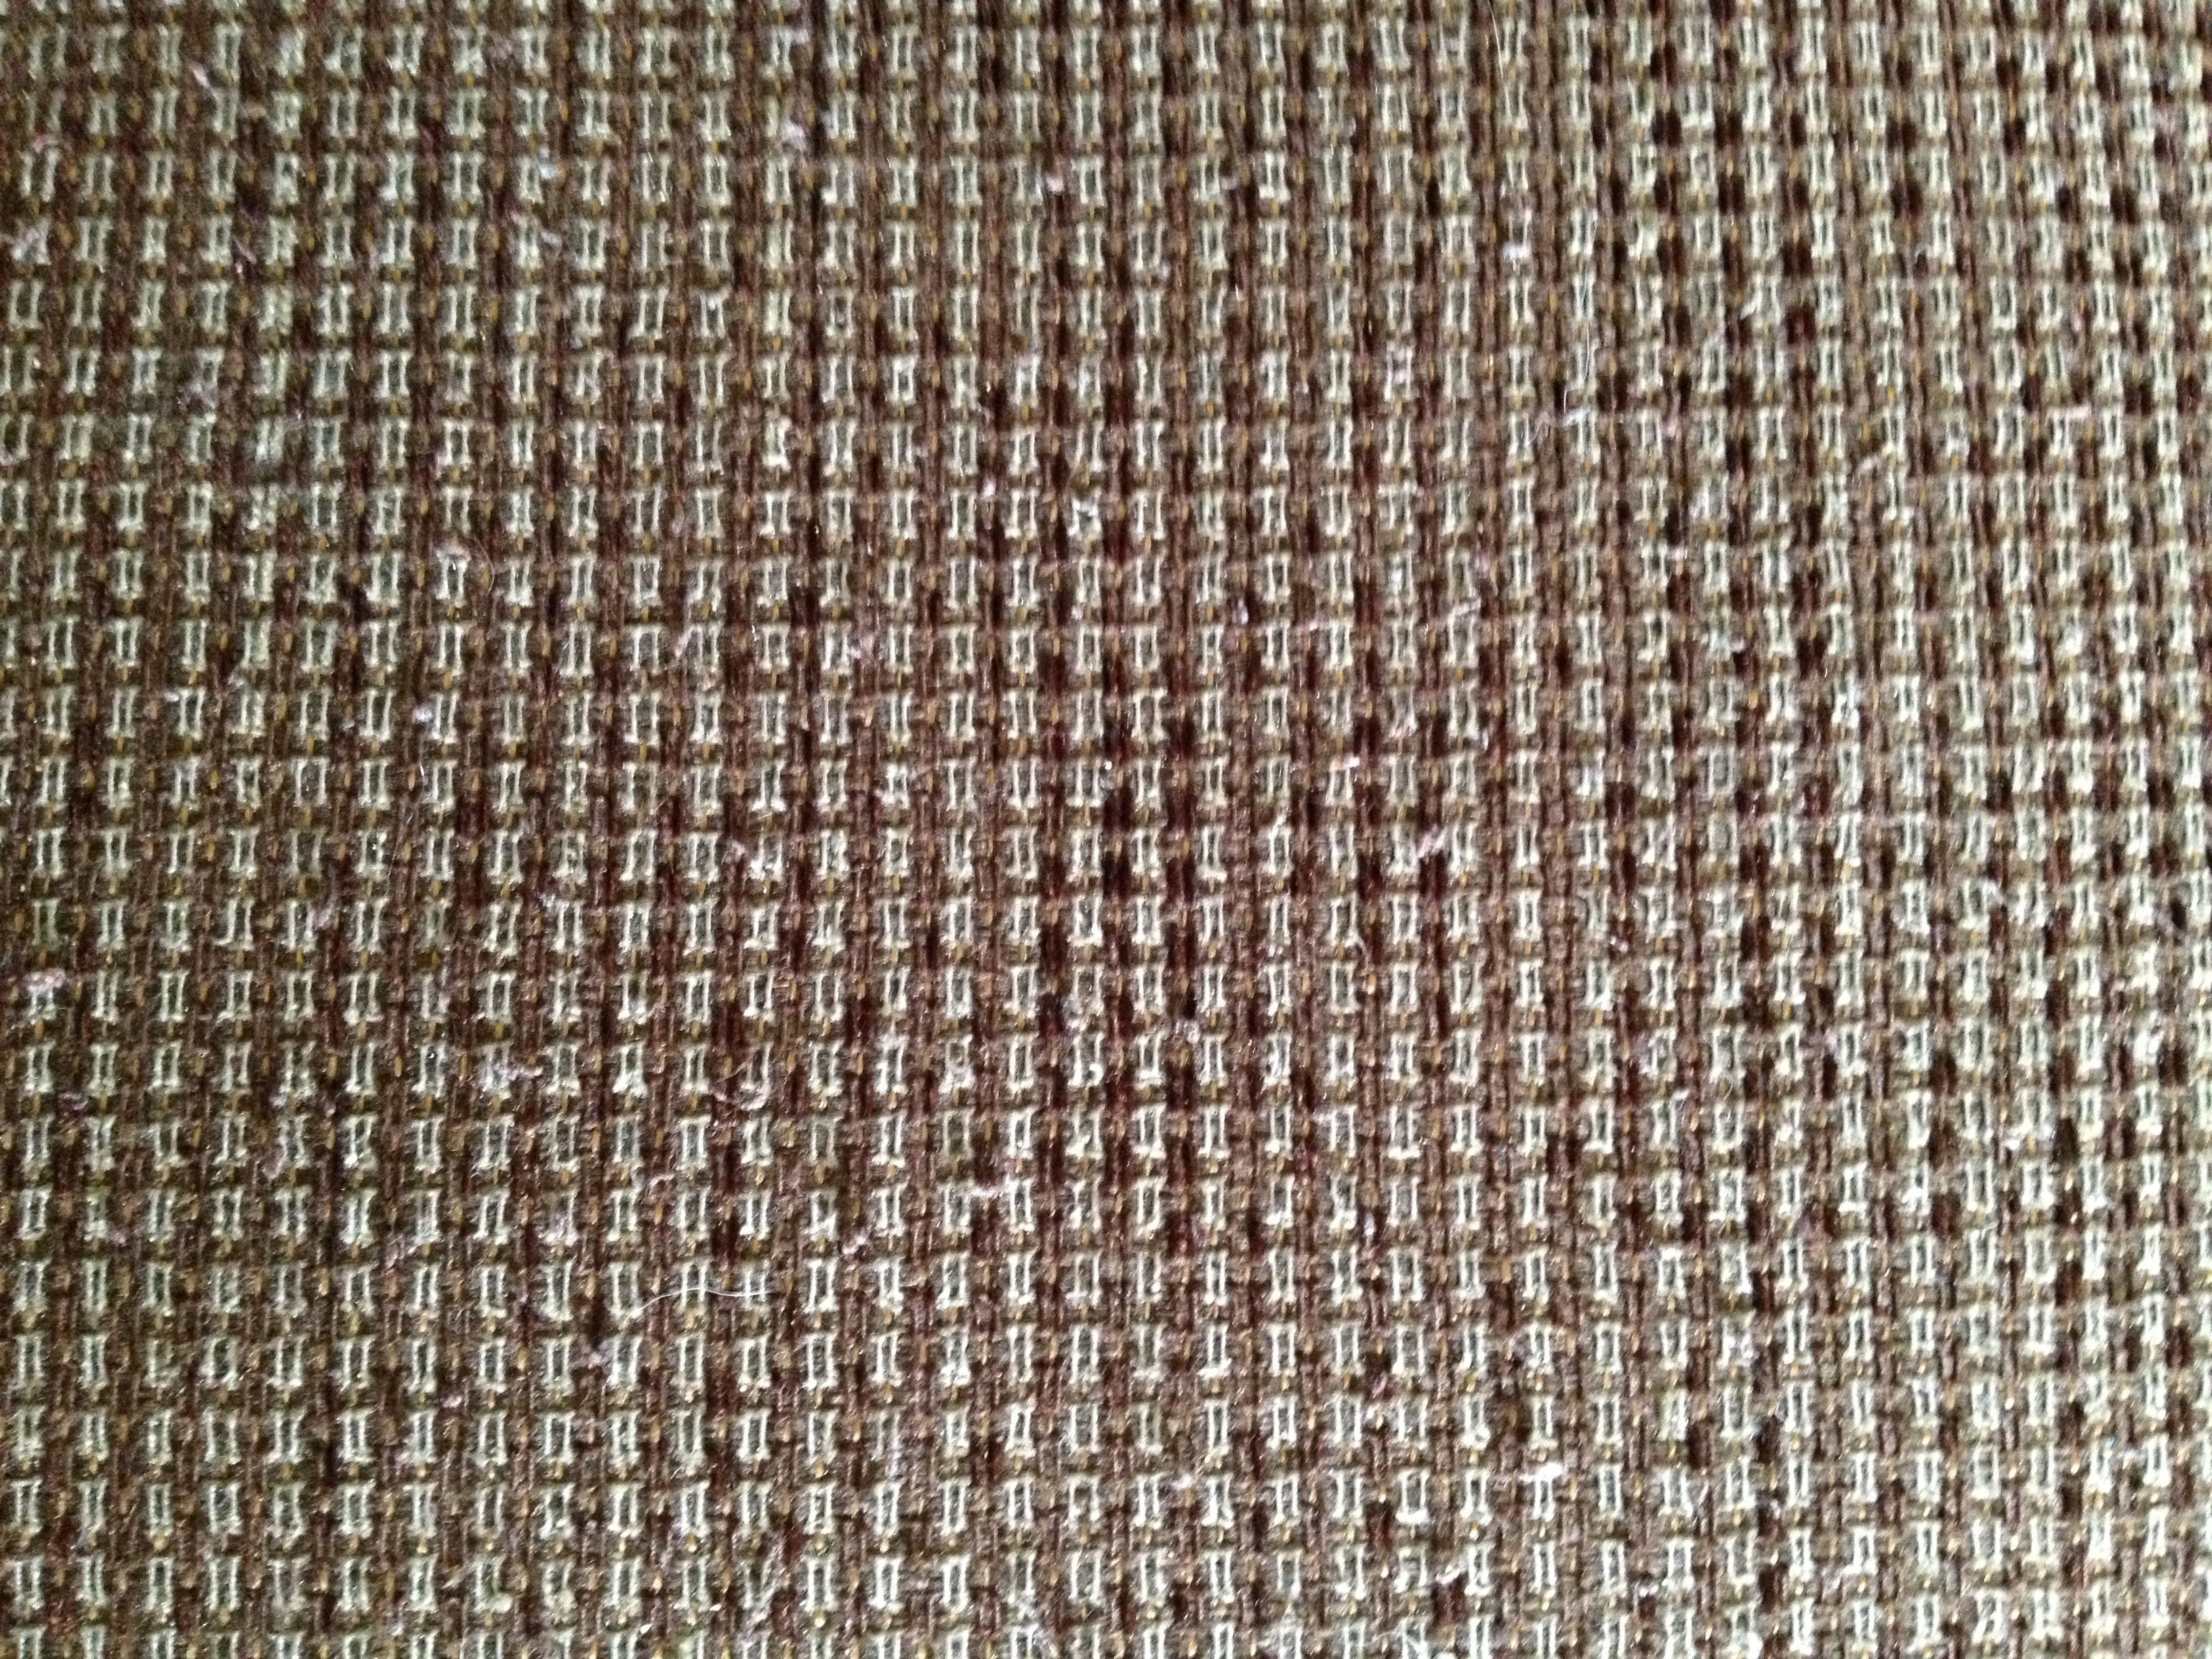 Akins Furniture Dogtown Alabama. The Dark Finish And Simplified Design Bsd With Akins Furniture ...